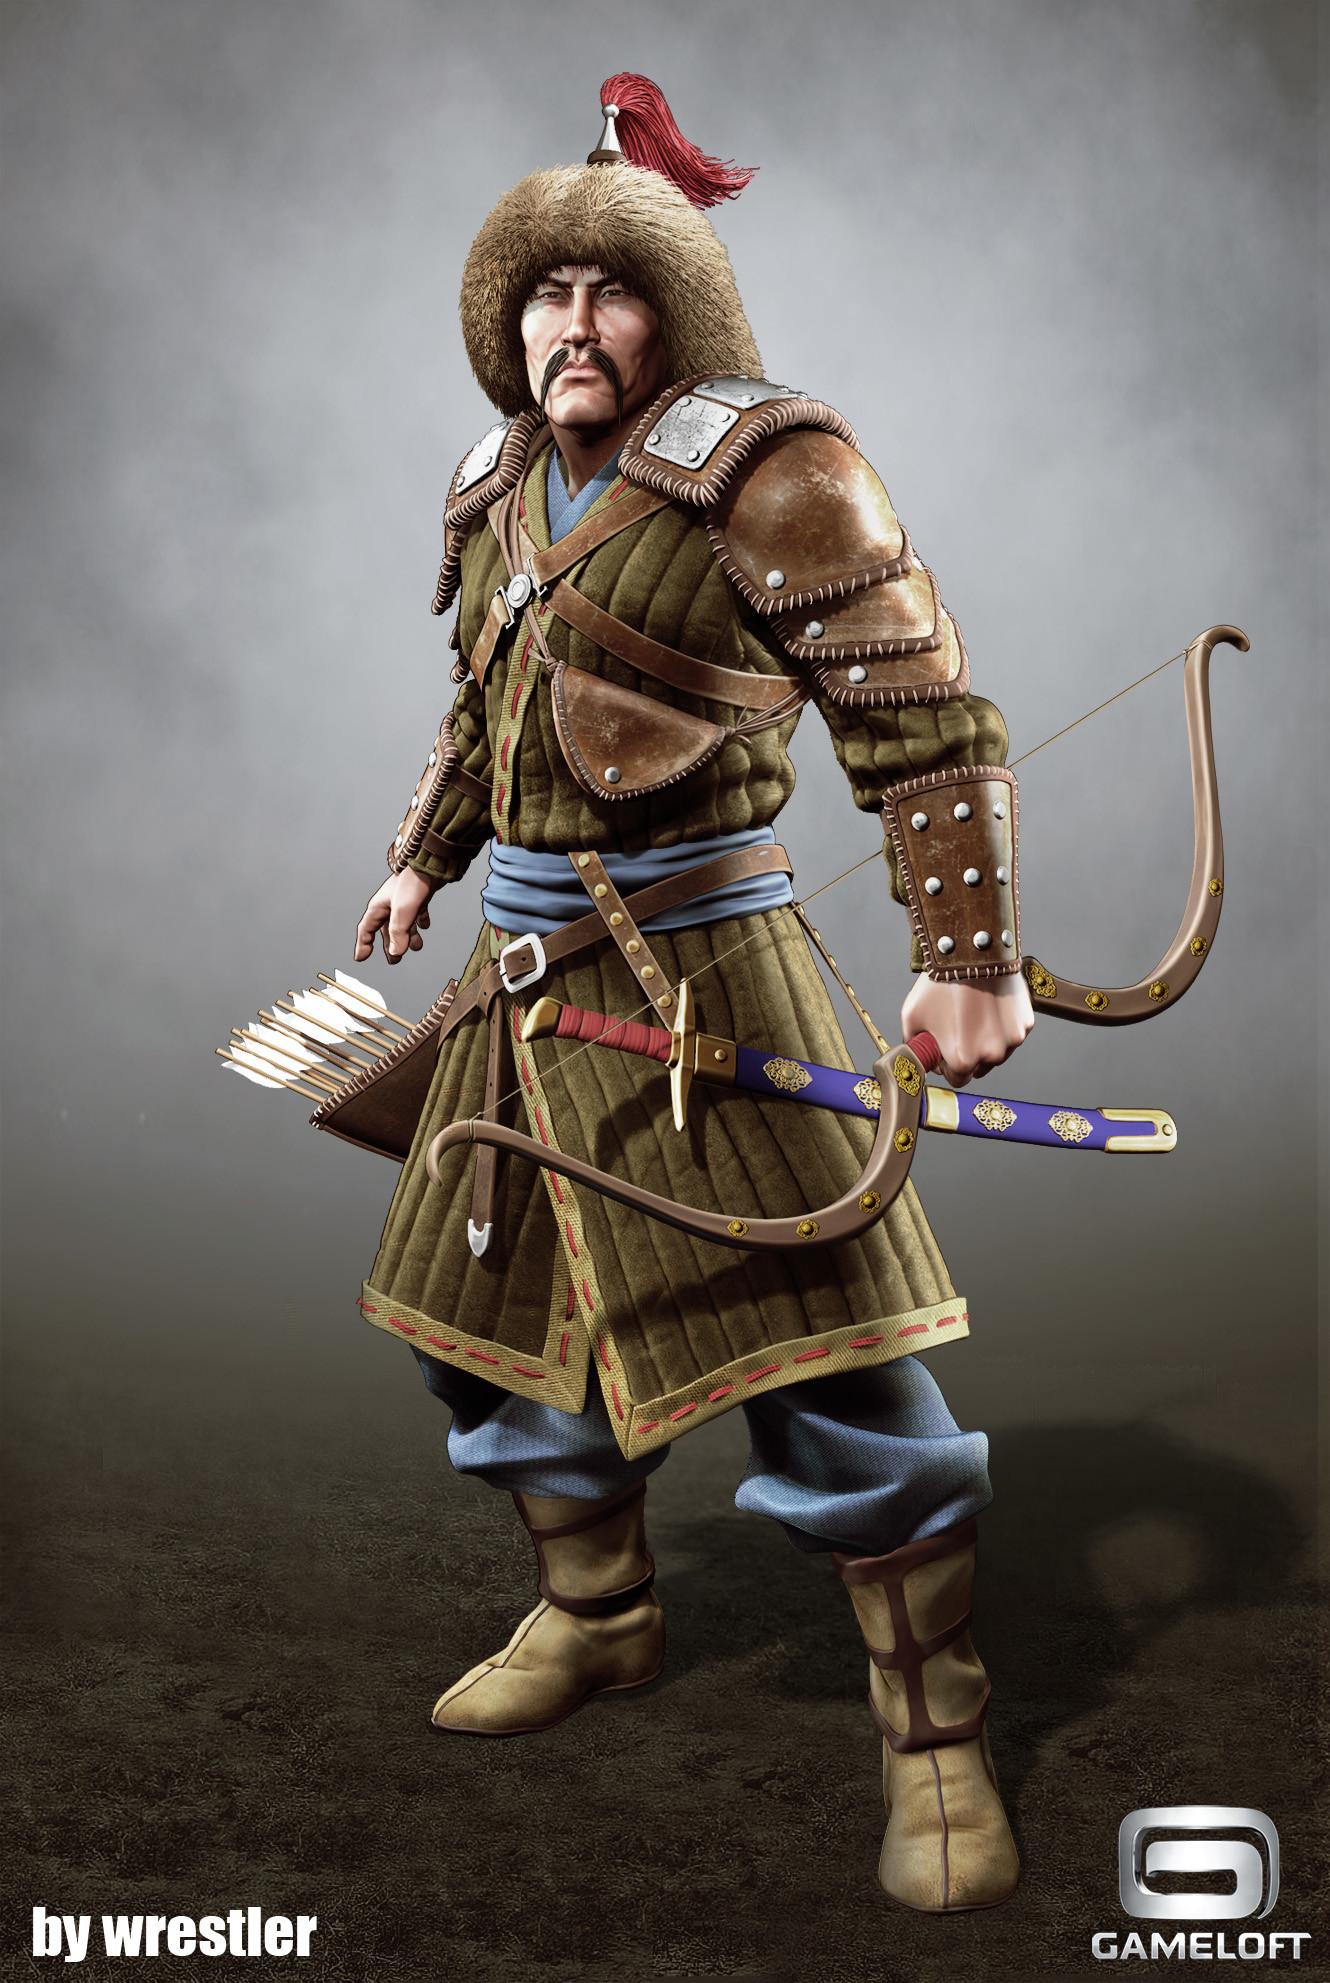 ArtStation - Tatar Warrior render, Georgi Georgiev